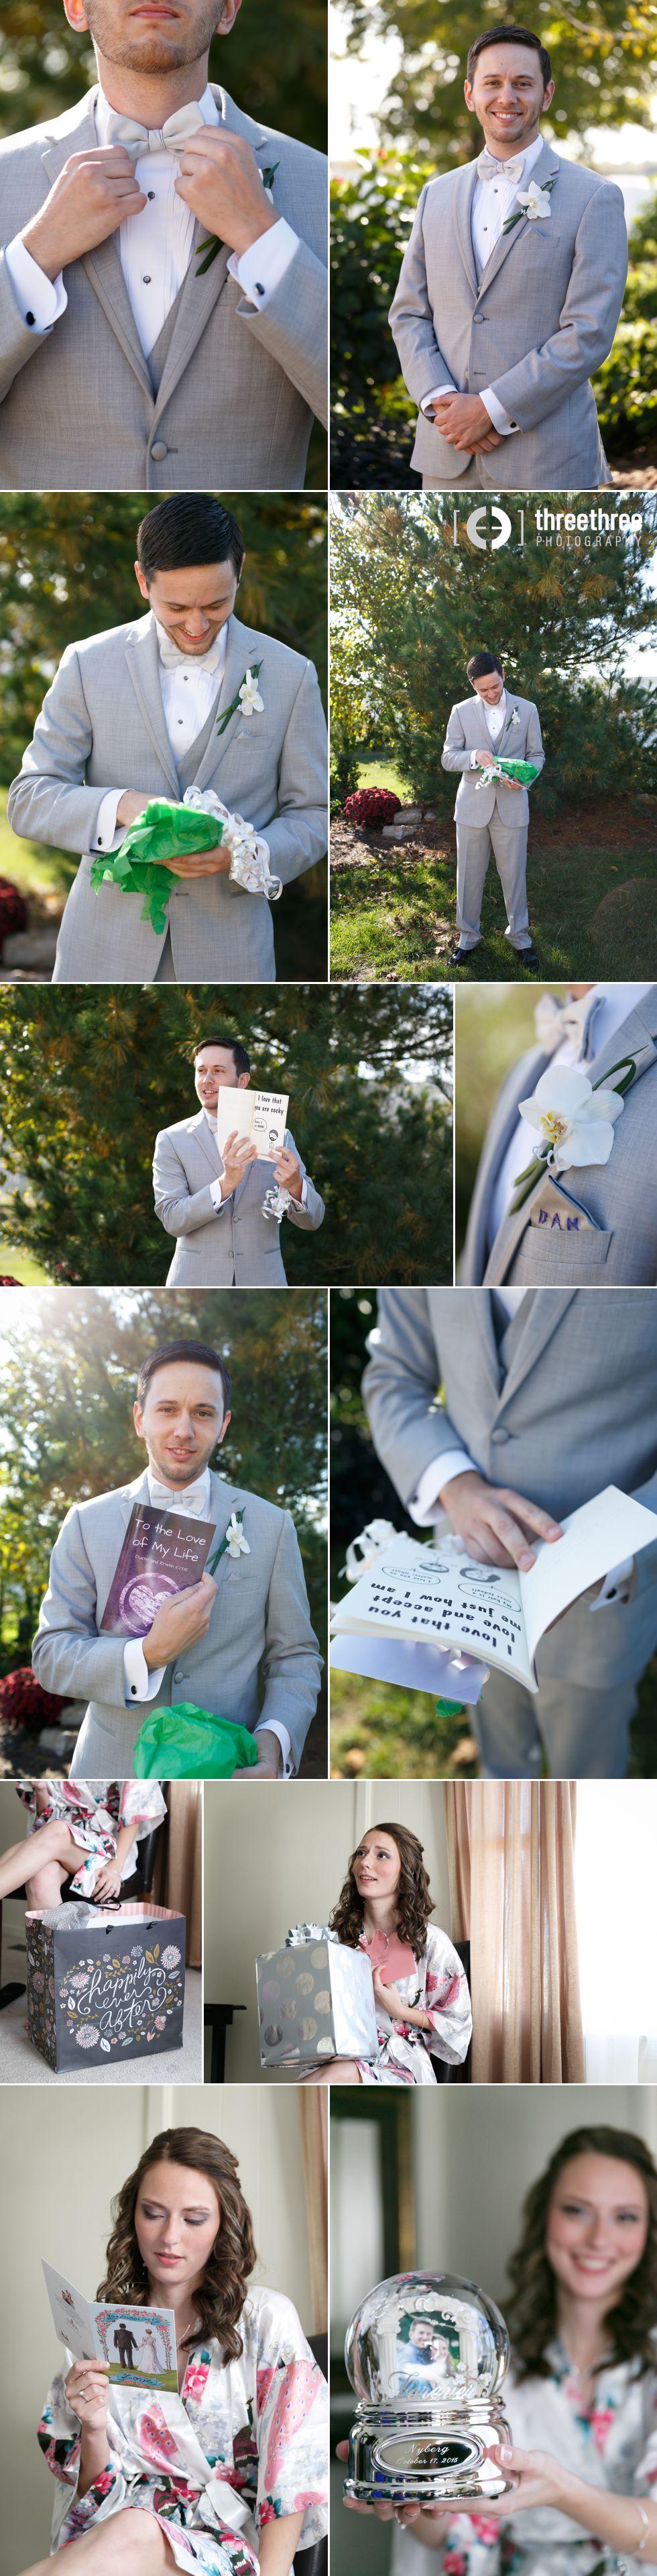 Kristin_Dustin_Wedding Blog 4